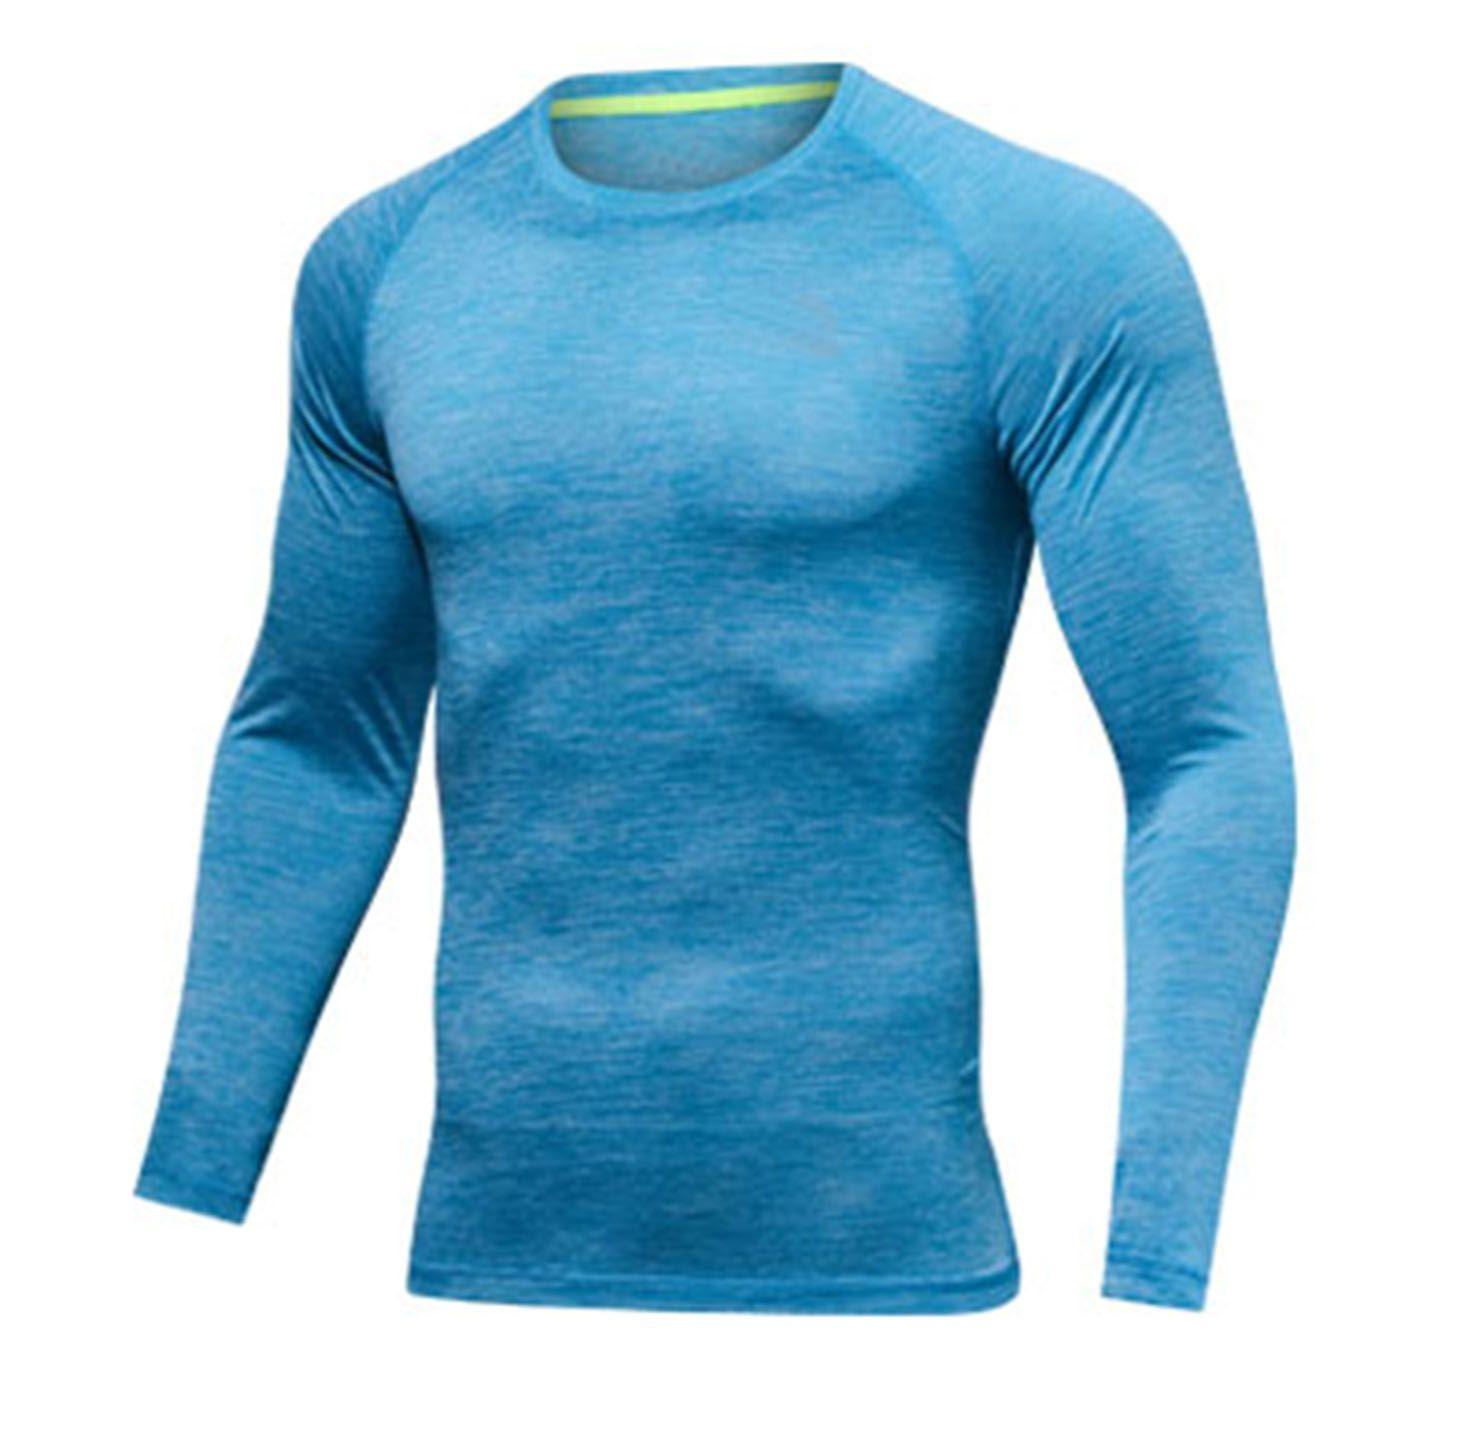 Men Long Sleeve ultrastretchable light weight Moisturewicking premium quality fabric gym workout running Active Wear Tshirt